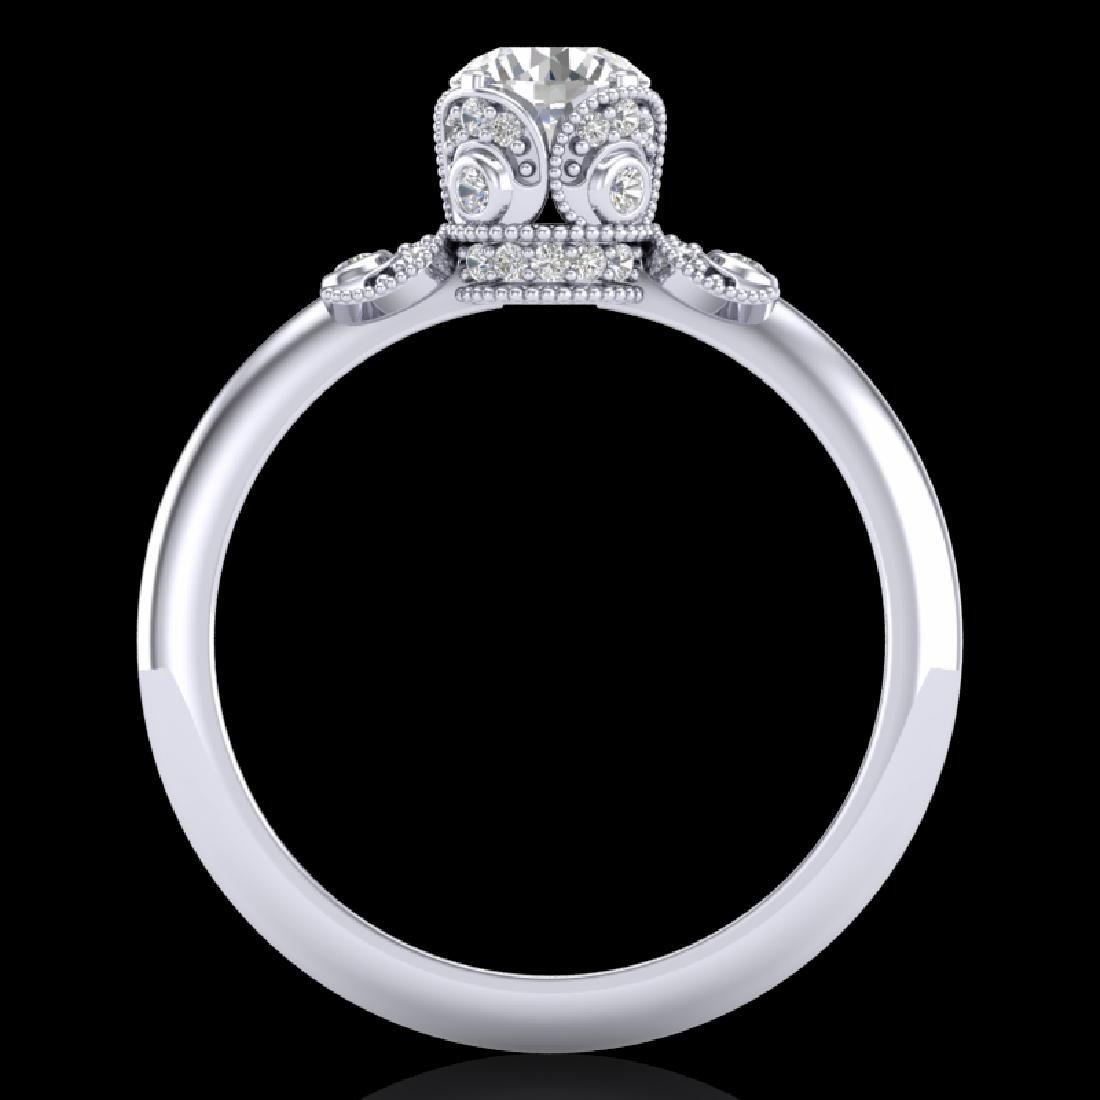 1 CTW VS/SI Diamond Solitaire Art Deco Ring 18K White - 2